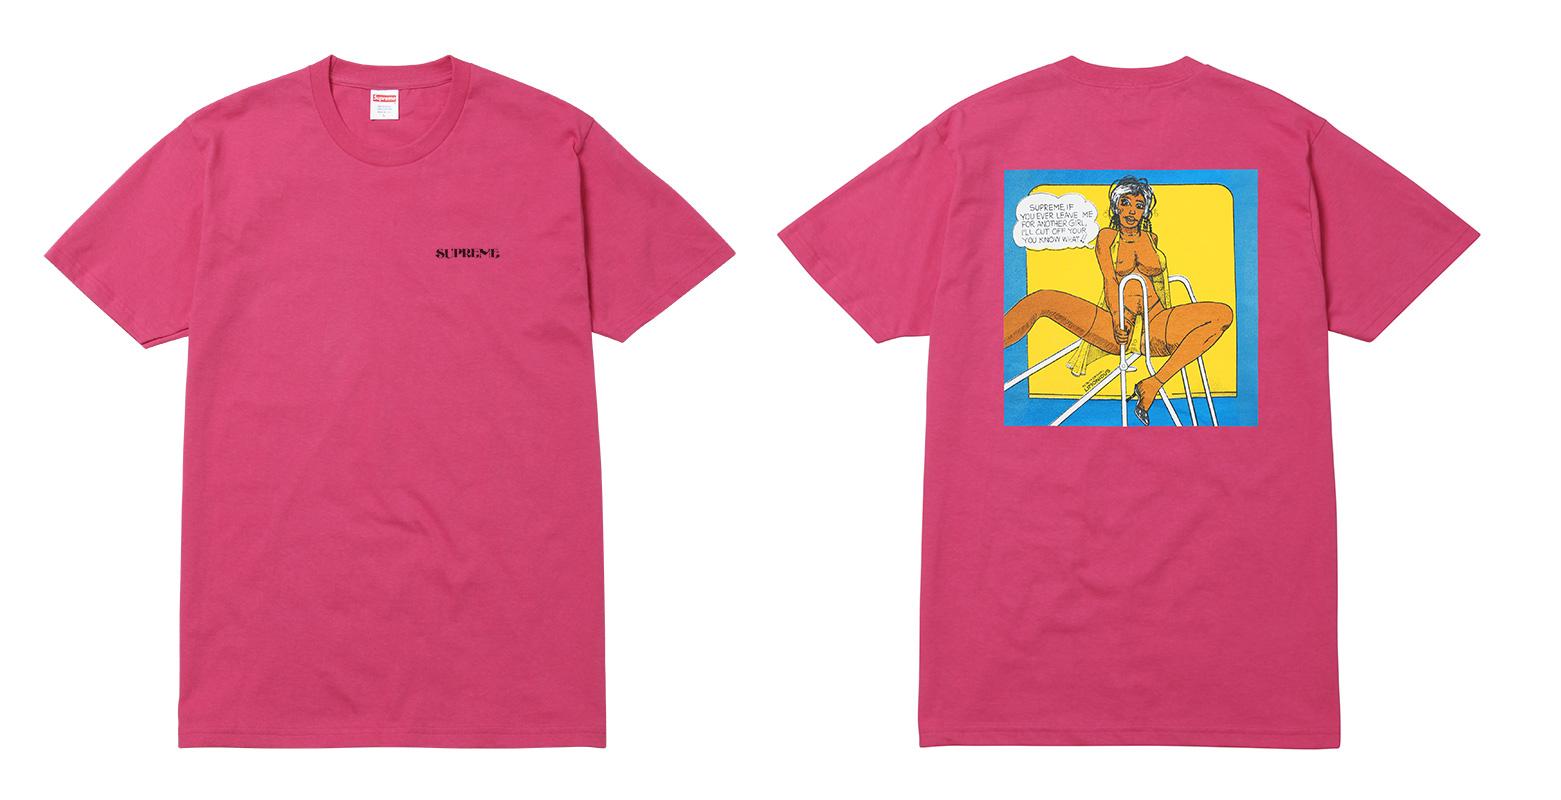 supreme camisetas verao 2017 04 - Supreme colabora com ilustrador Wilfred Limonious